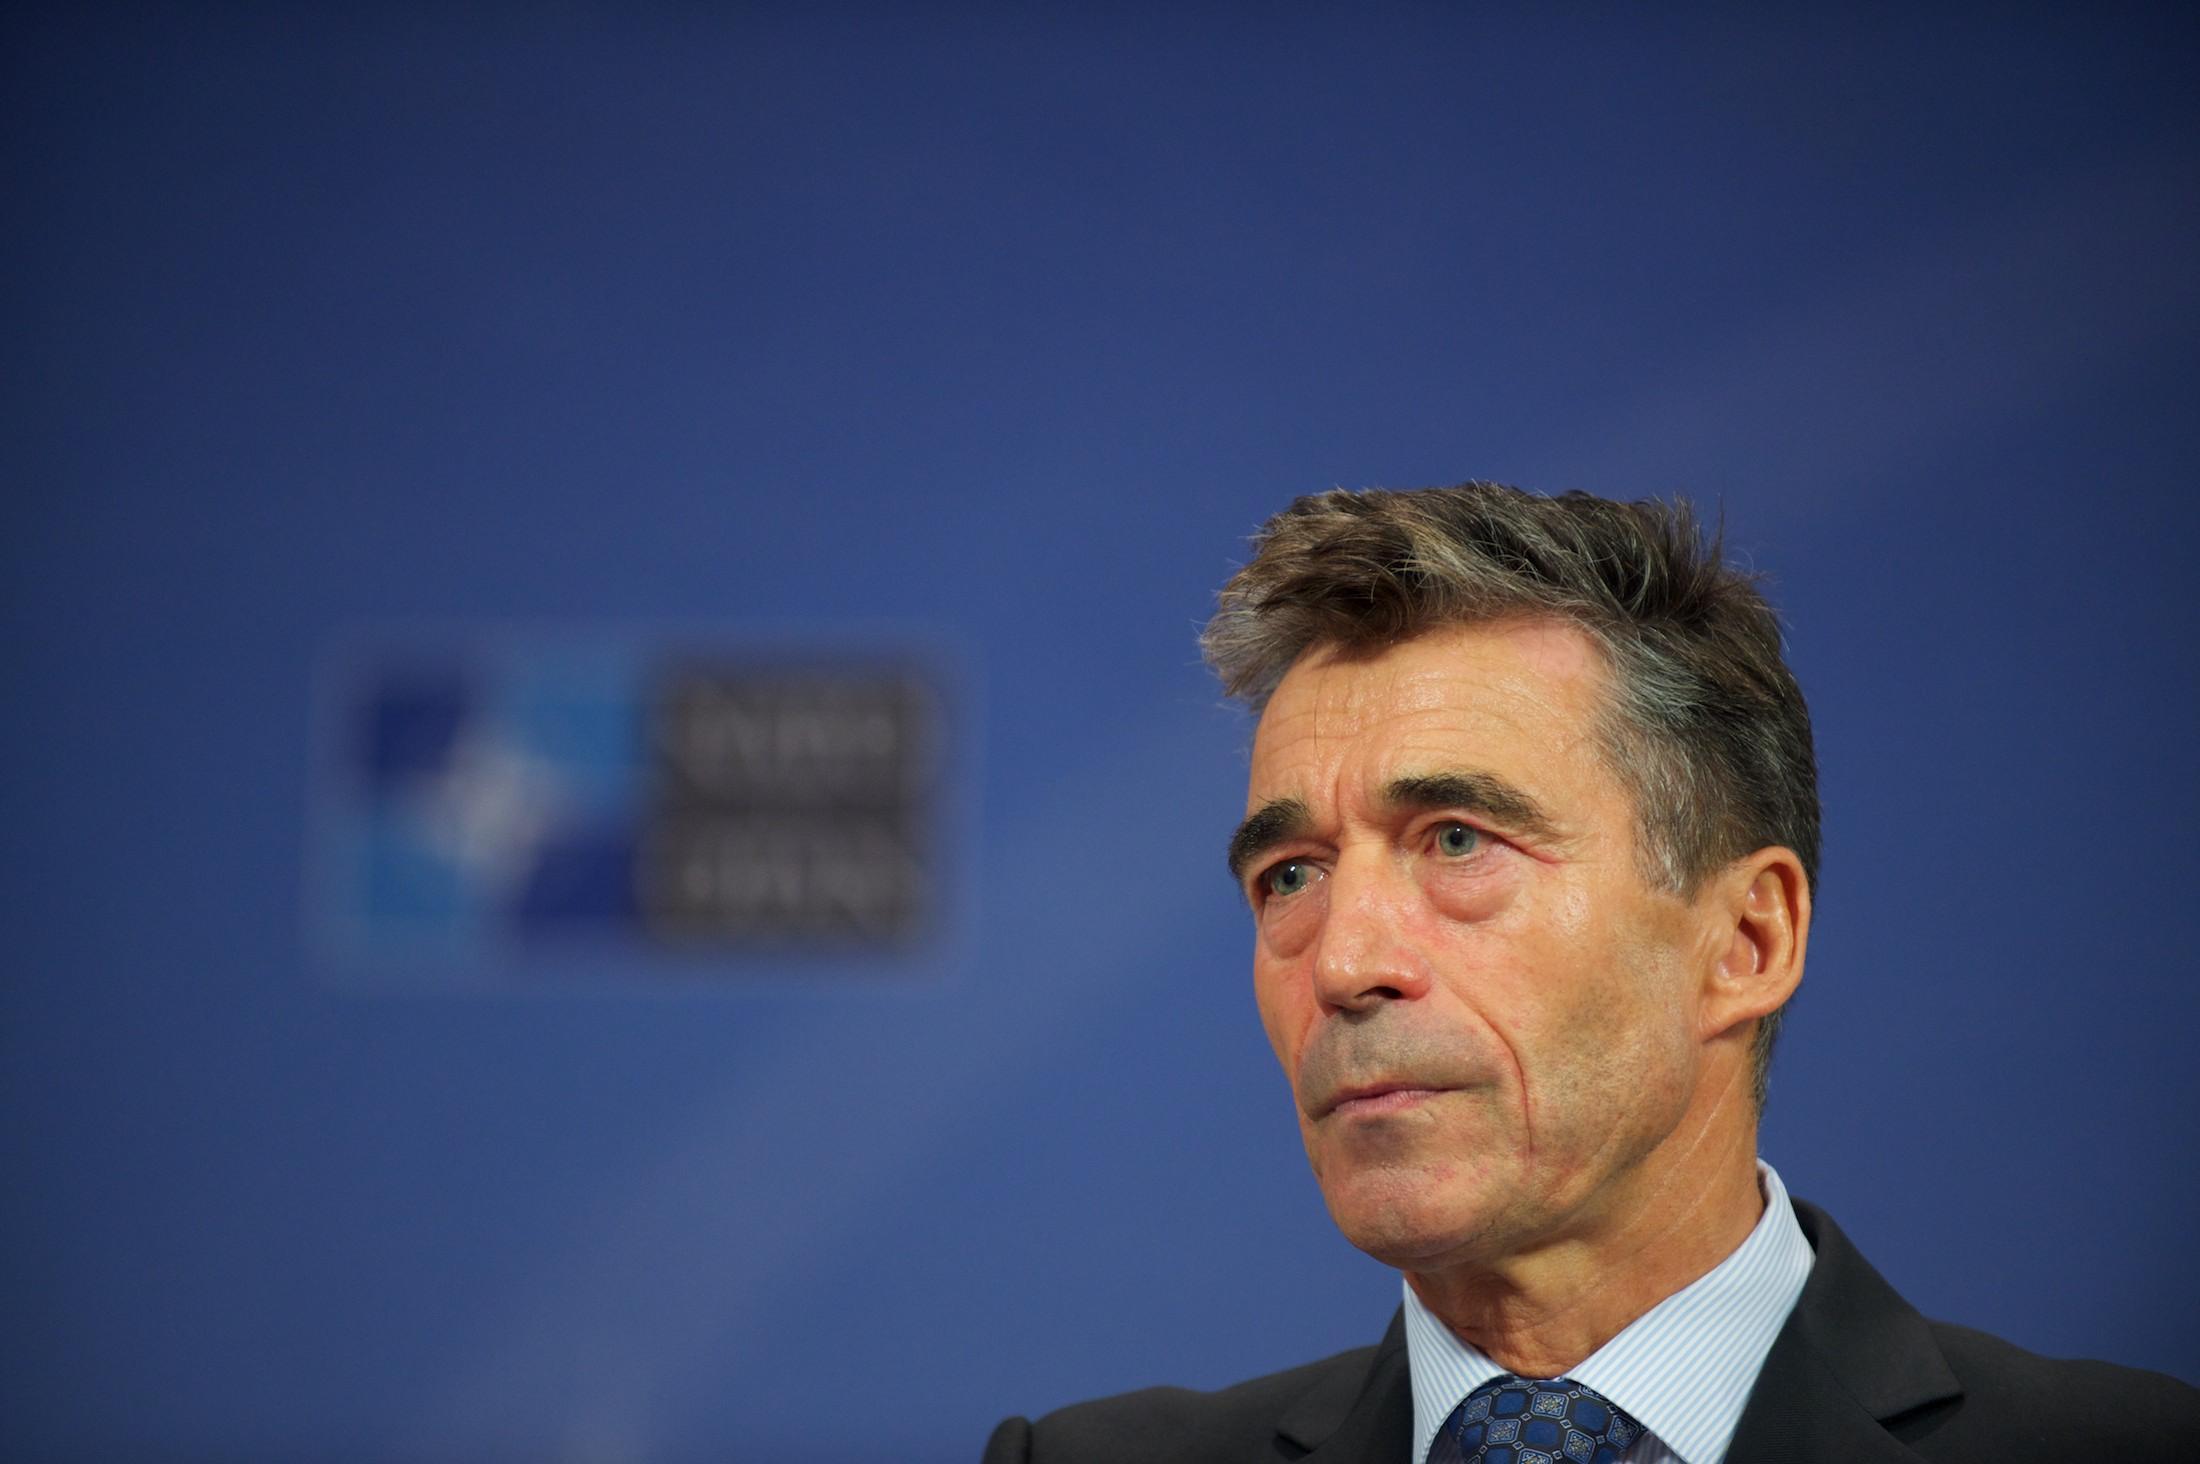 NATO Secretary General Anders Fogh Rasmussen, October 10, 2013